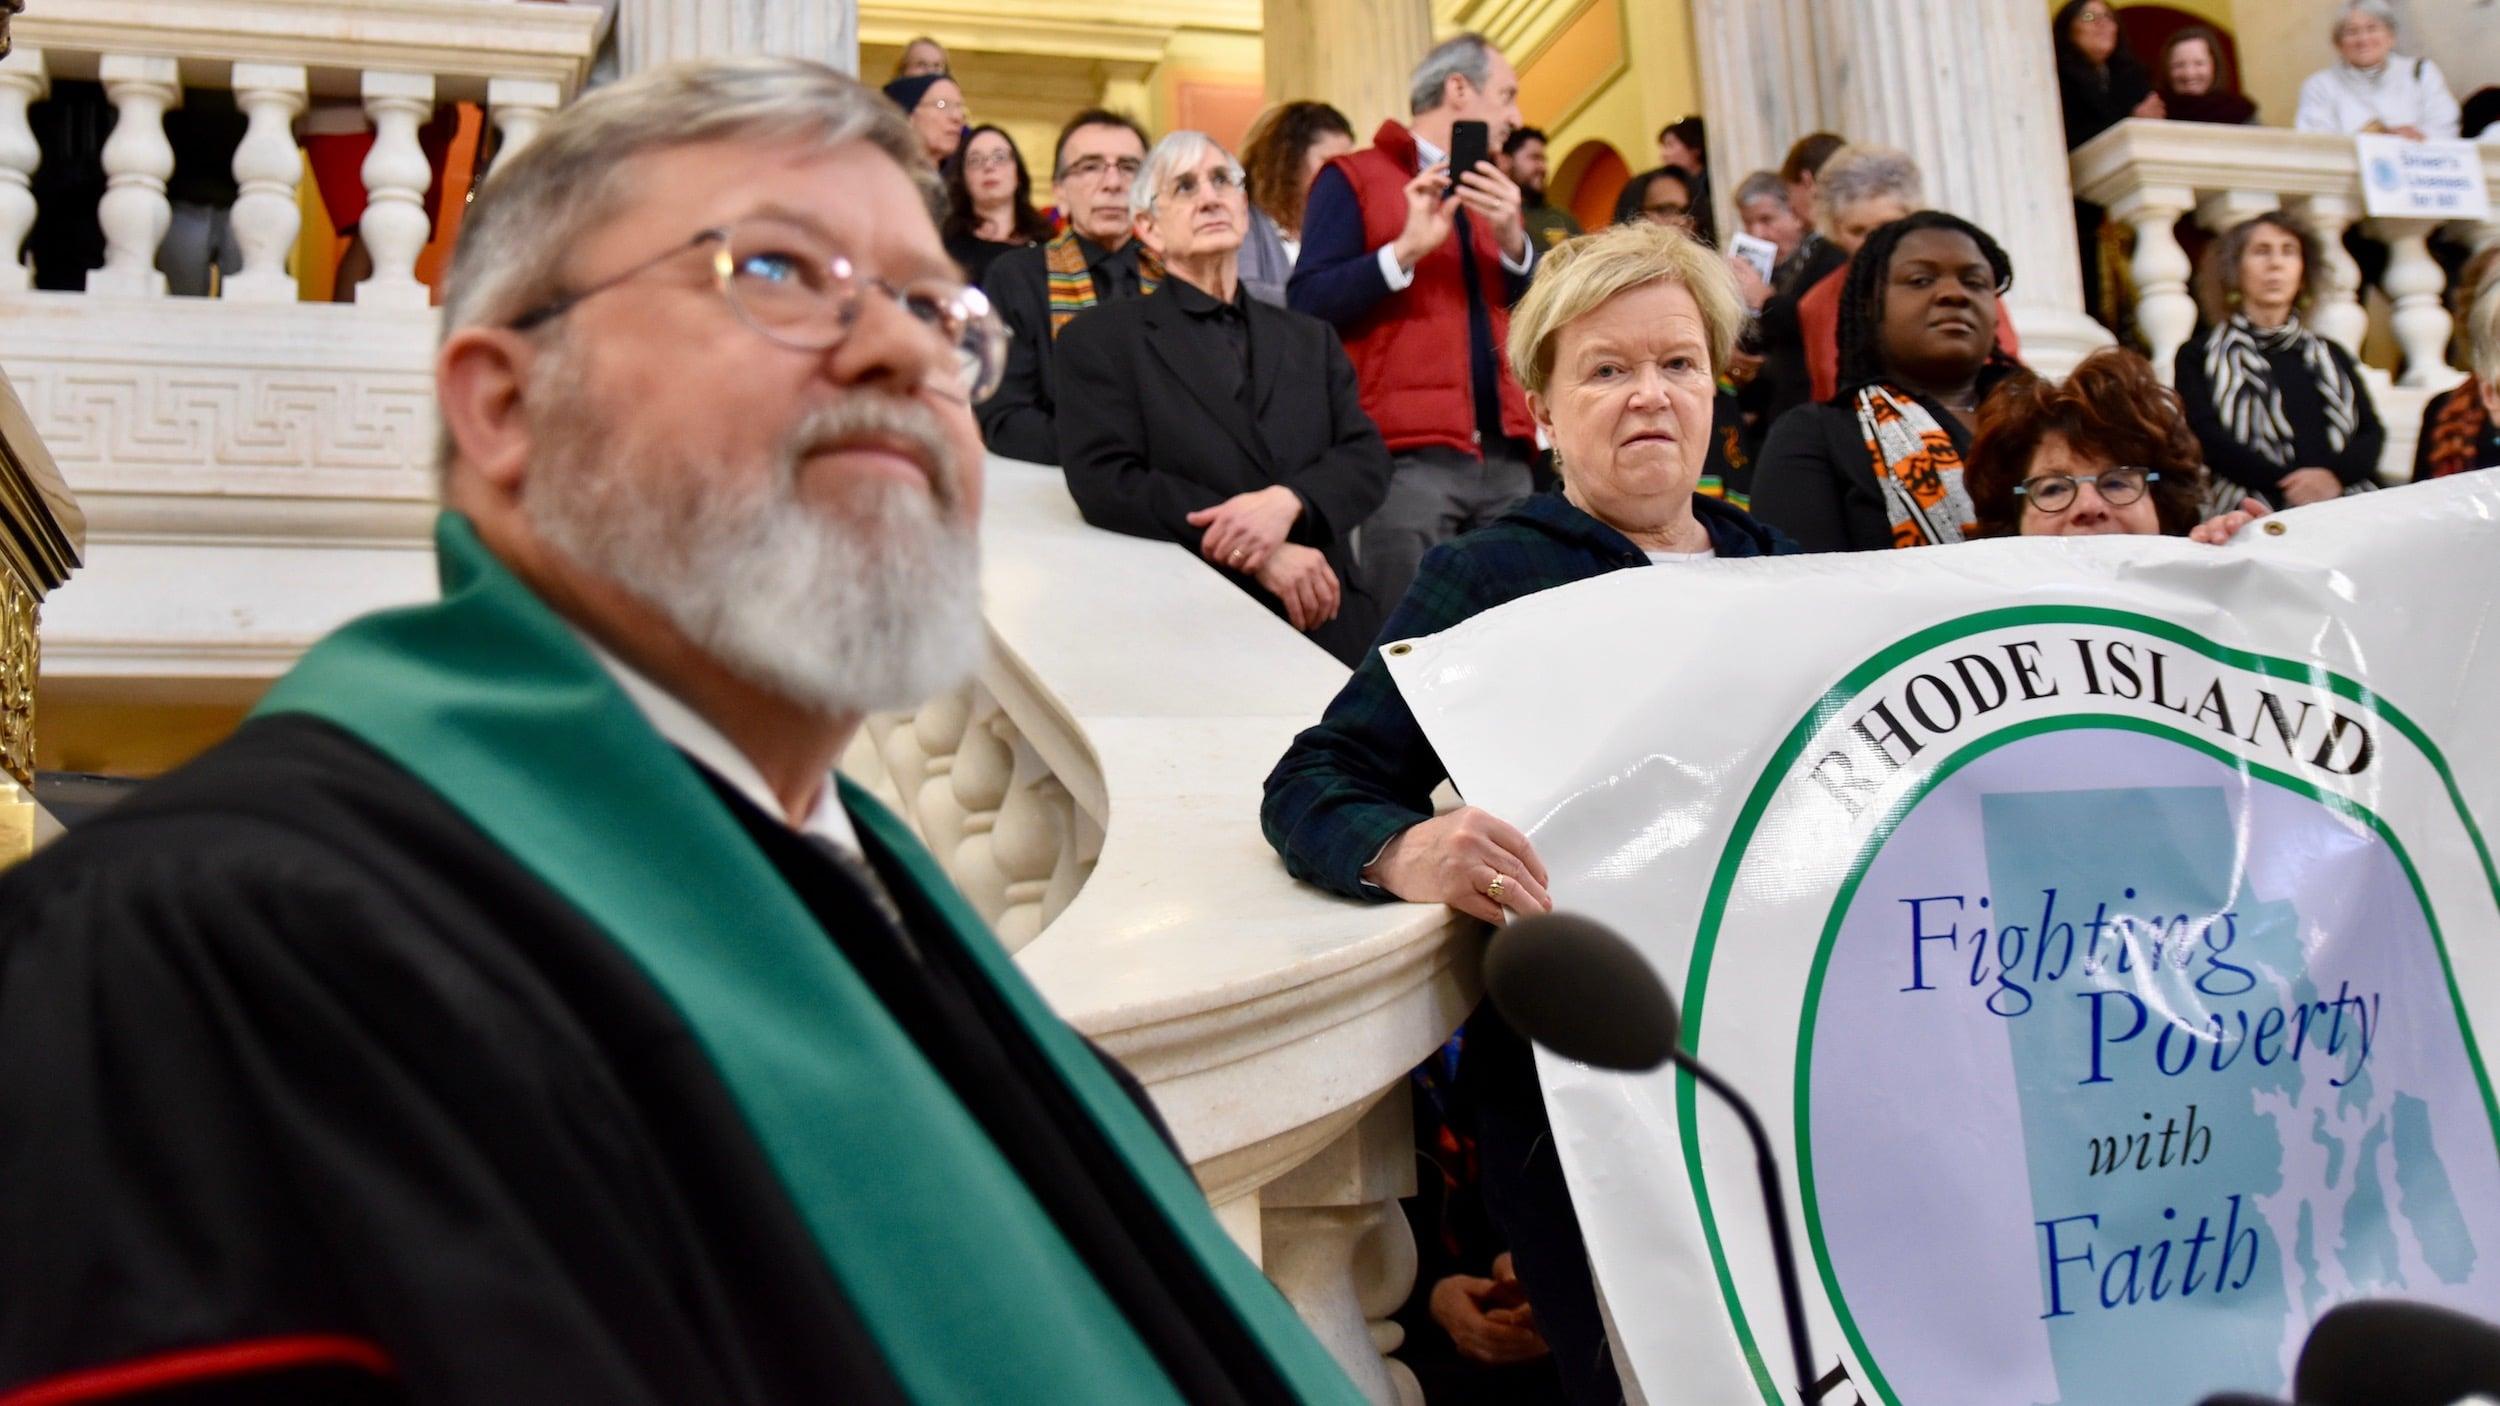 Photo for 12th Annual Fighting Poverty with Faith Vigil launches anti-poverty legislative agenda